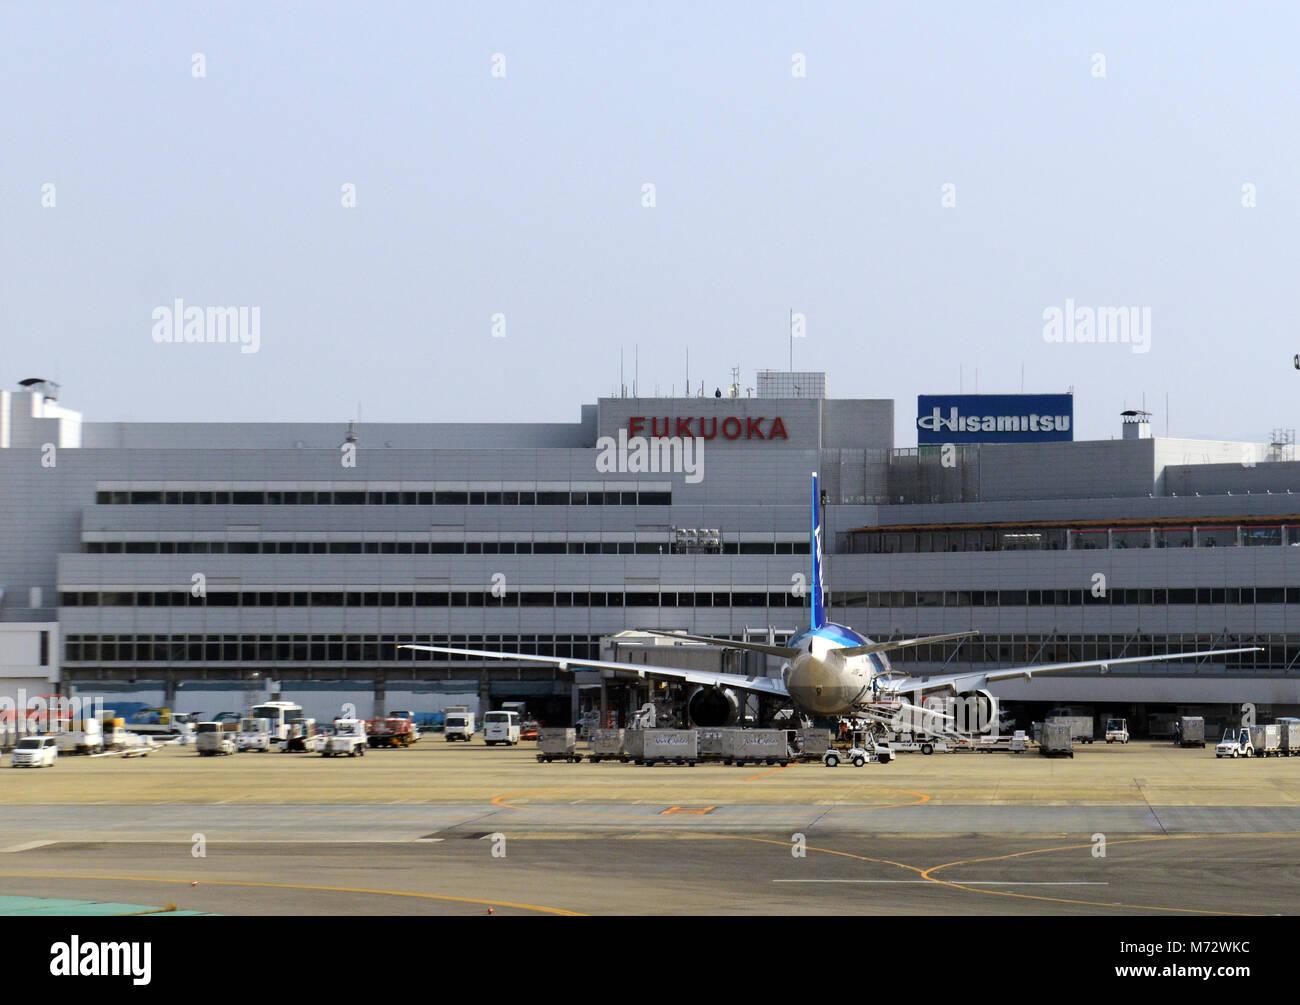 Fukuoka international airport. - Stock Image